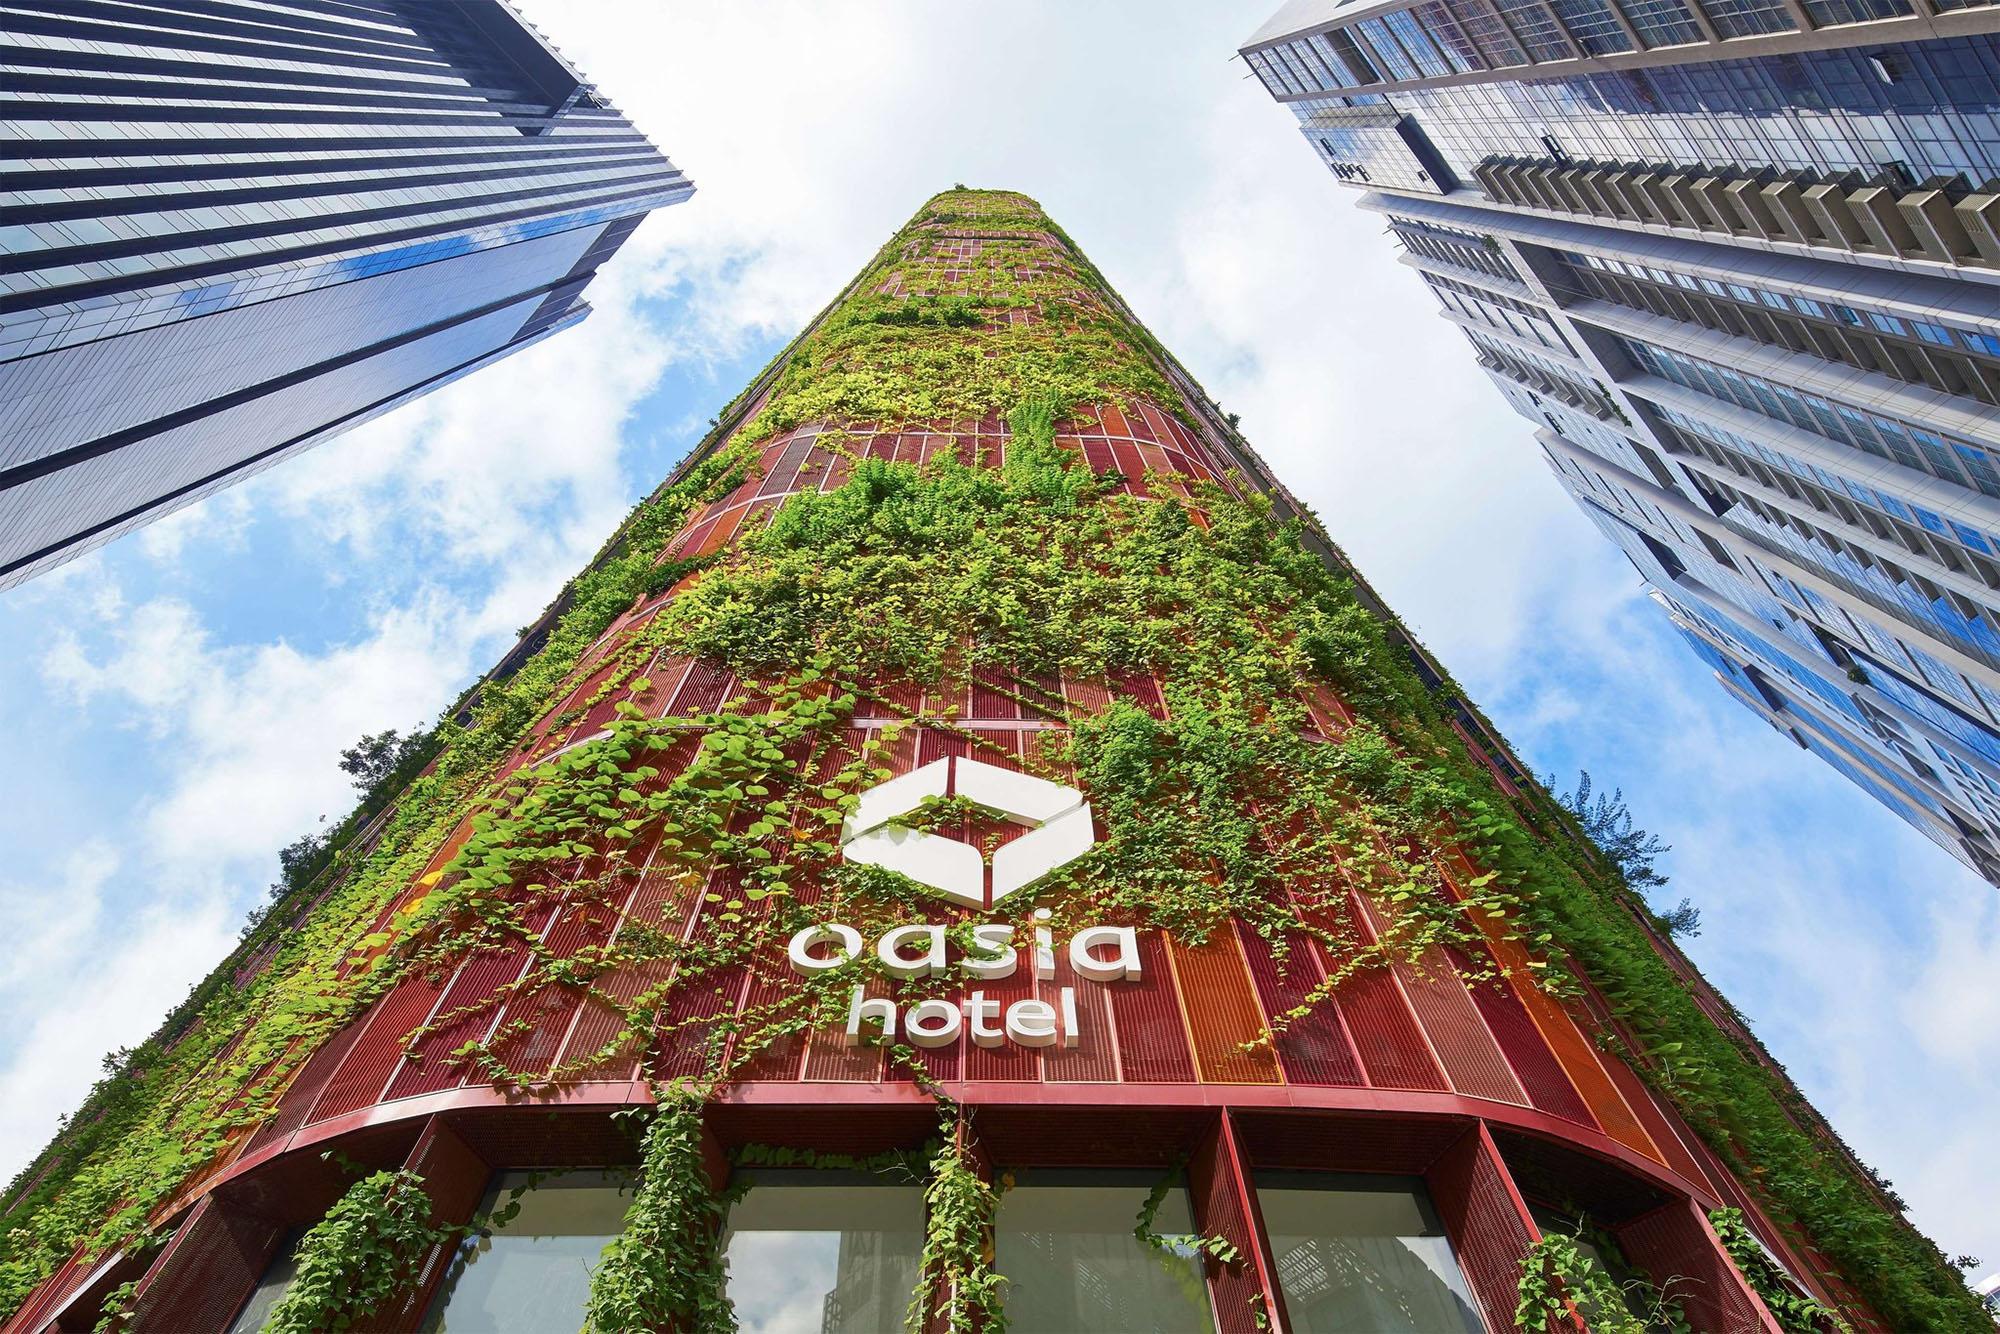 Oasia Hotel Downtown (Far East Hospitality)